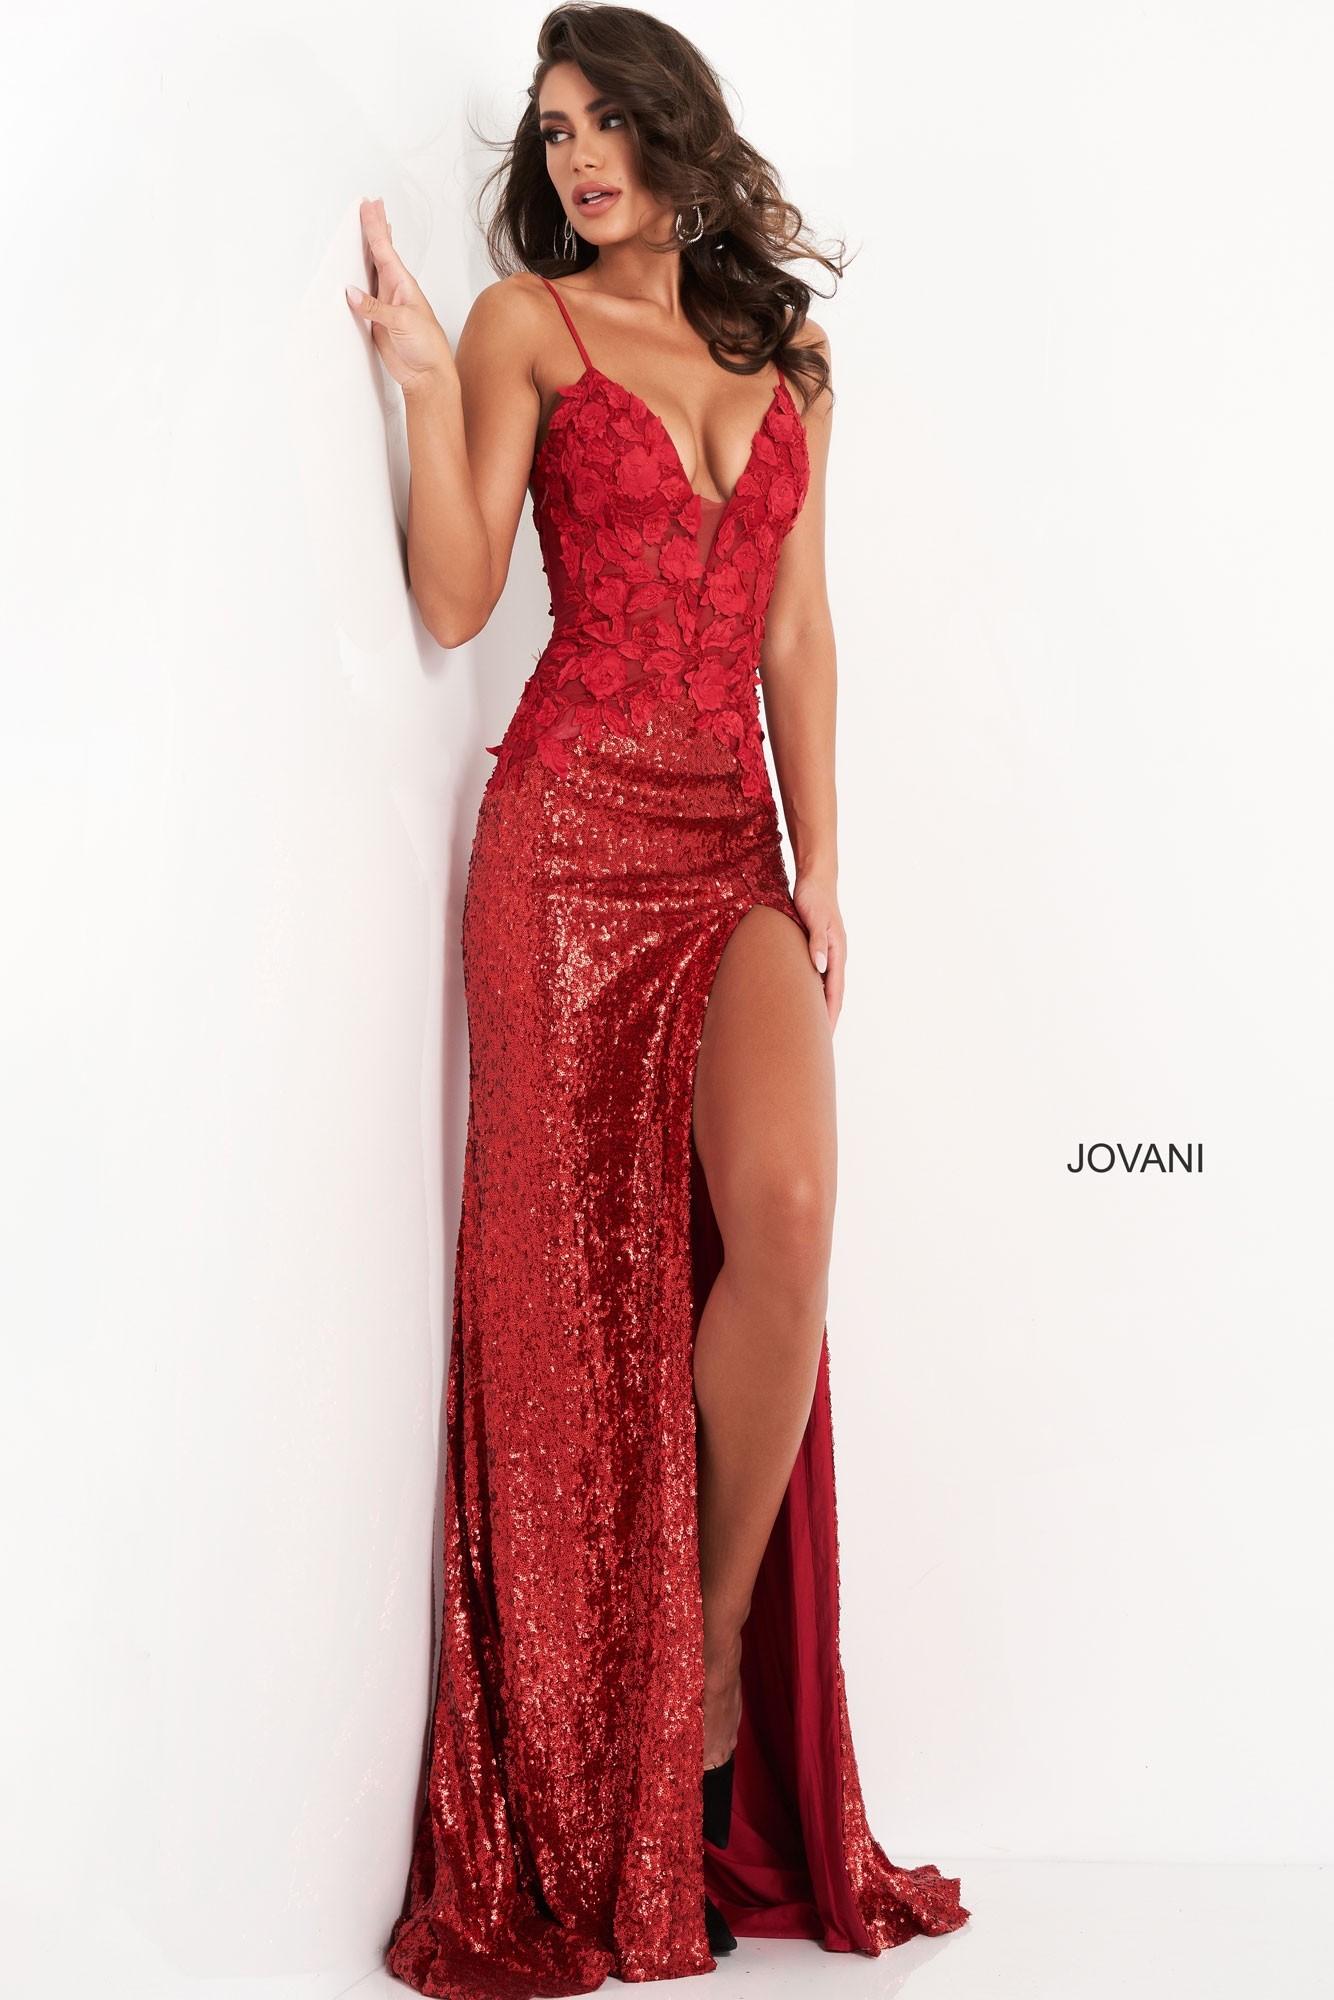 Jovani 06426 Sequin Prom Dress